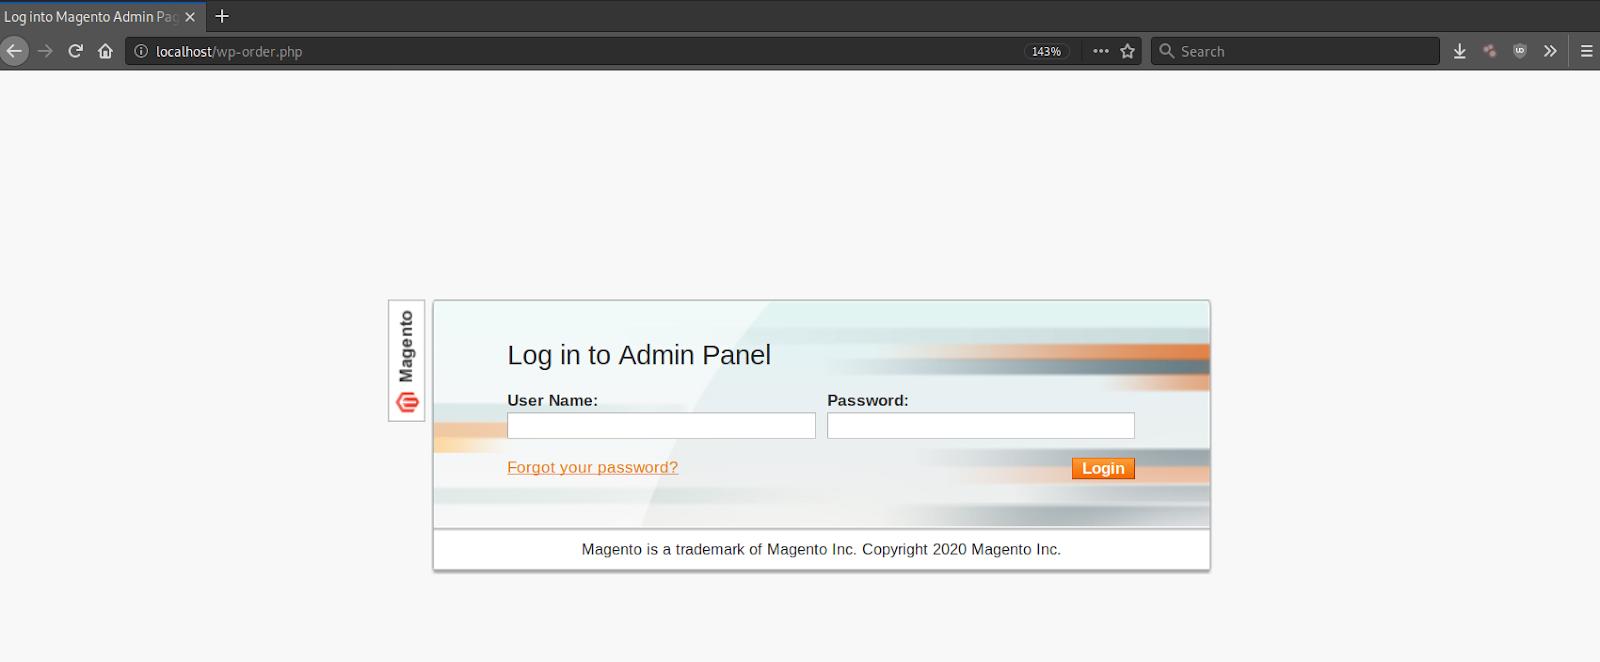 Magento Admin Panel Phishing